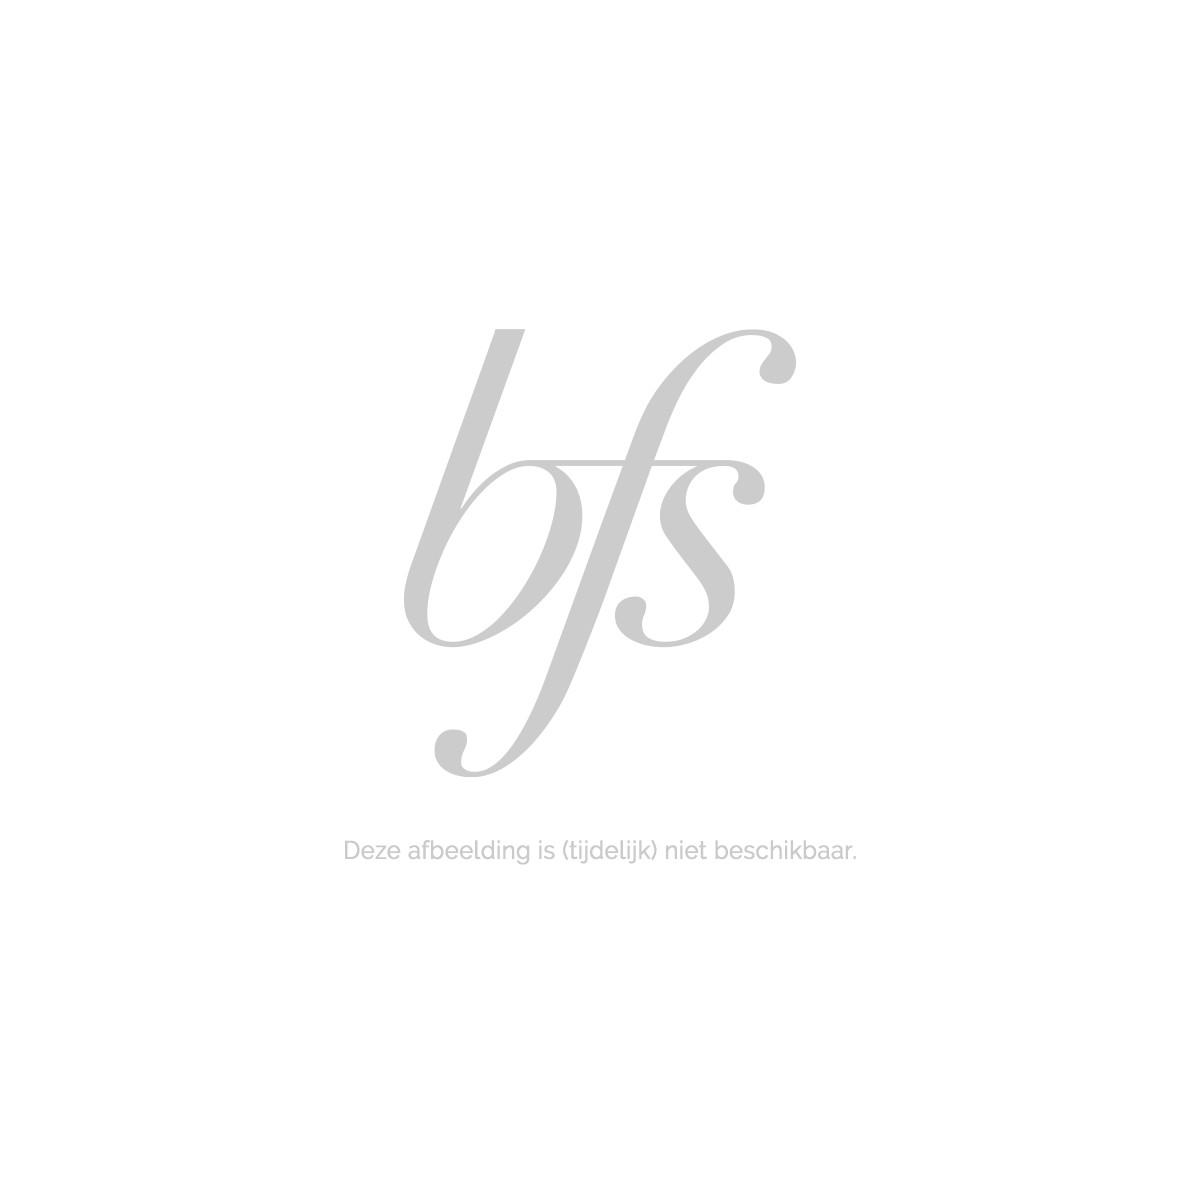 Afbeelding van Dr. Eckstein Azulen Supreme 50 Ml Crème Roodheid Beauty